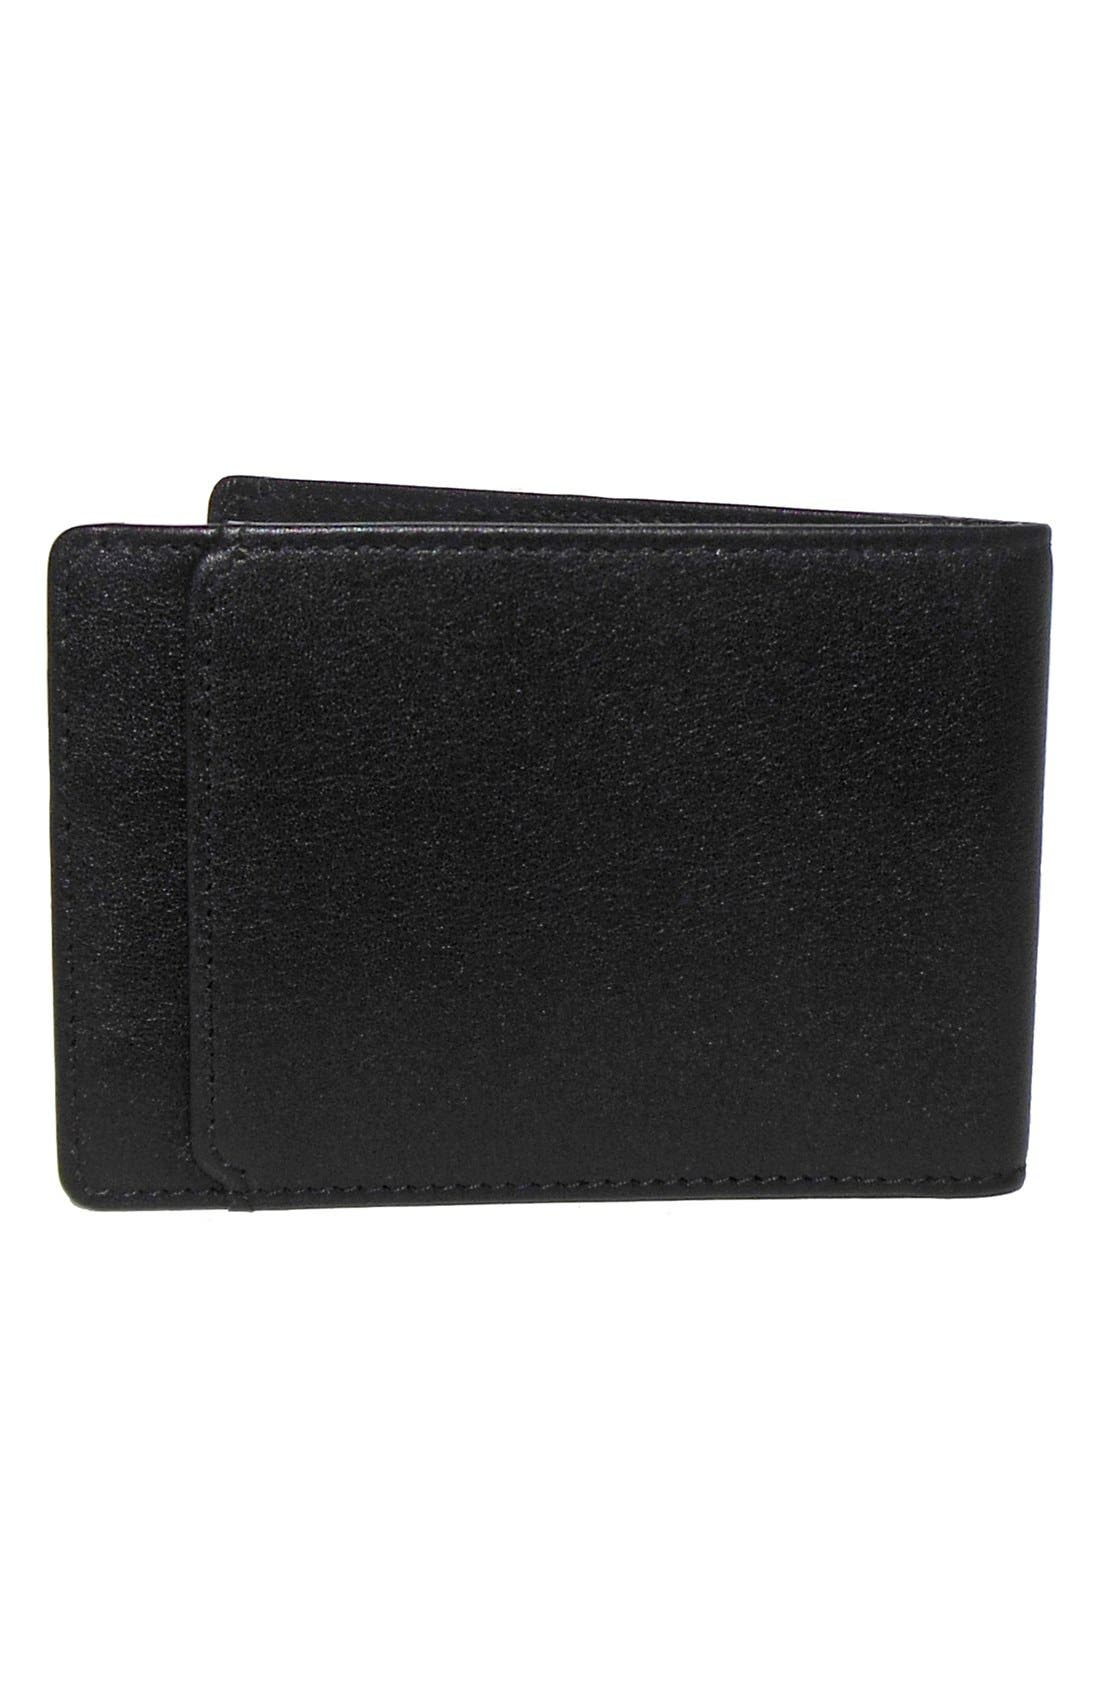 'Grant Slimster' RFID Blocker Leather Wallet,                             Alternate thumbnail 3, color,                             Black/ Grey